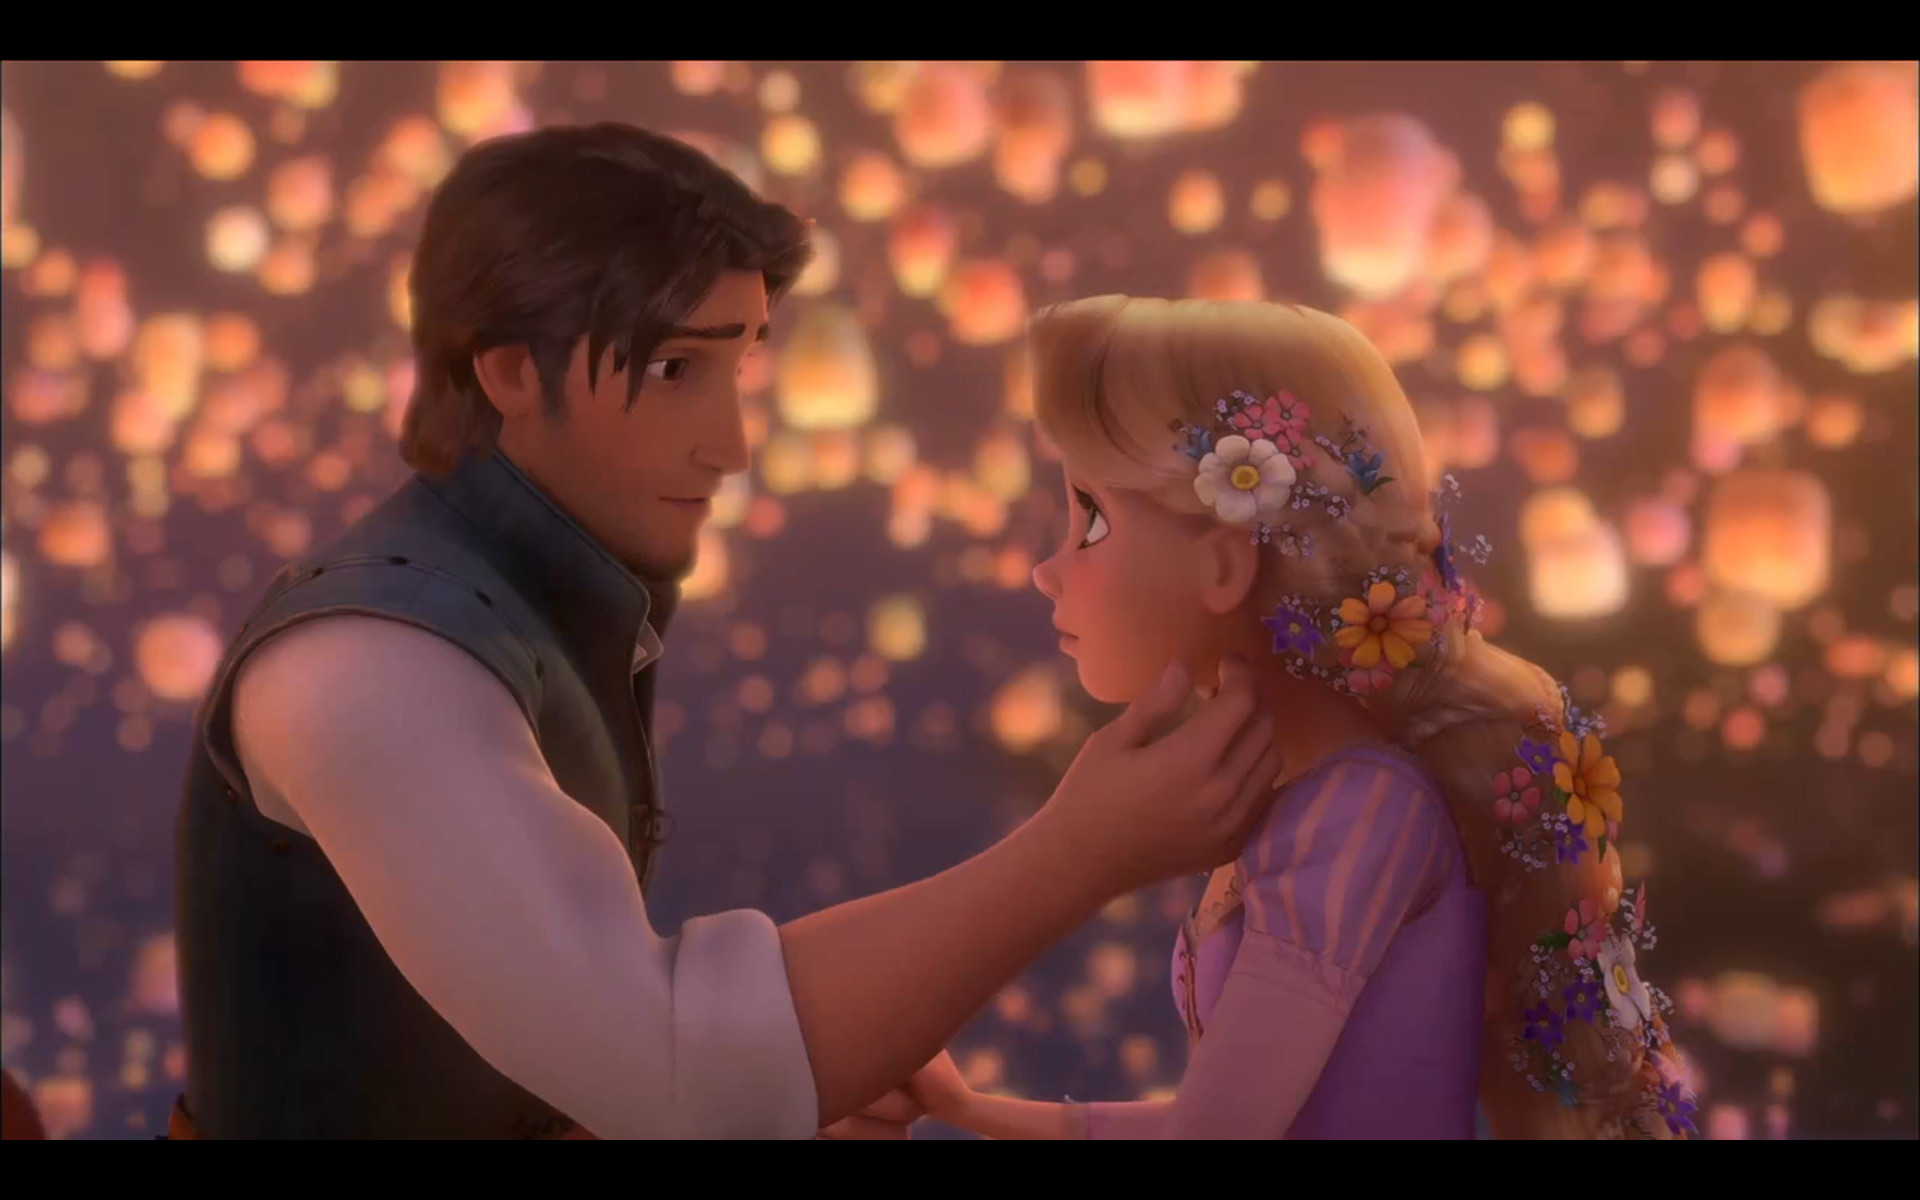 Tangled Rapunzel and Flynn